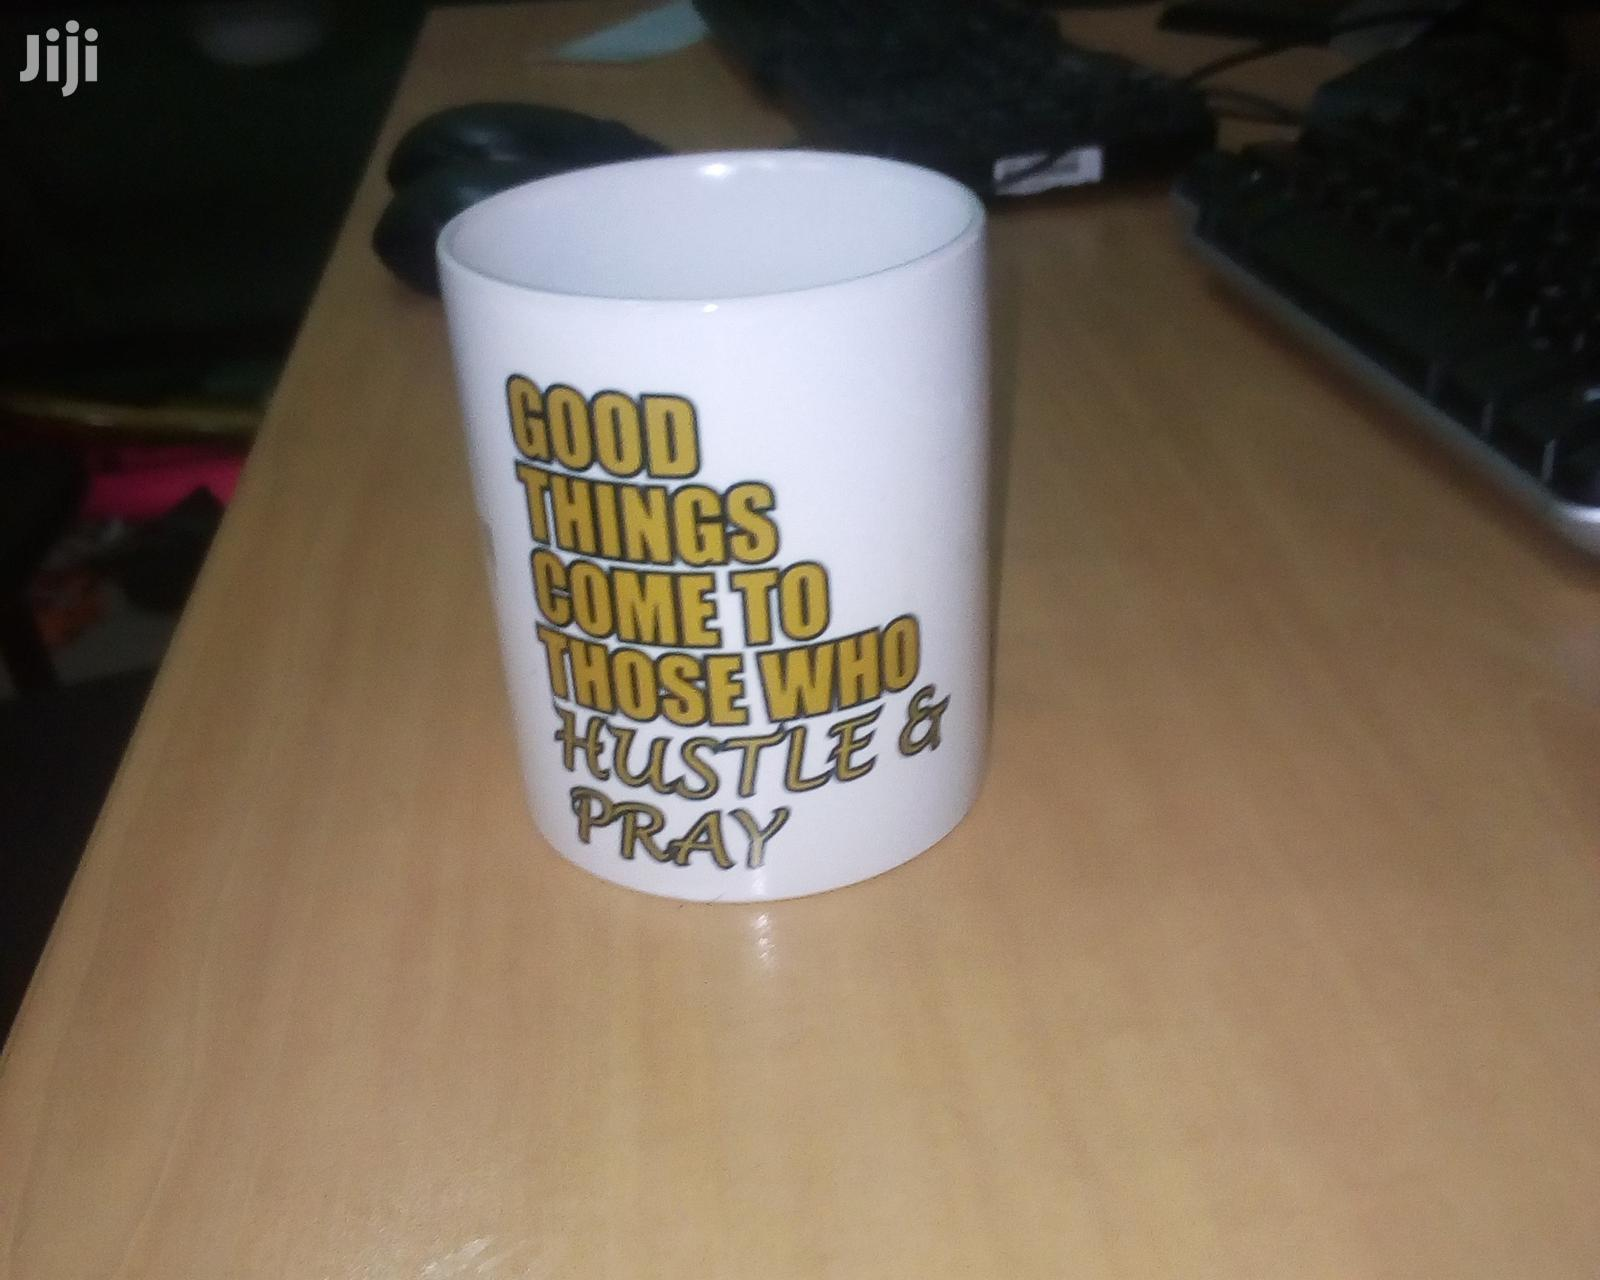 Mug Printings And Cooperate Gift Items